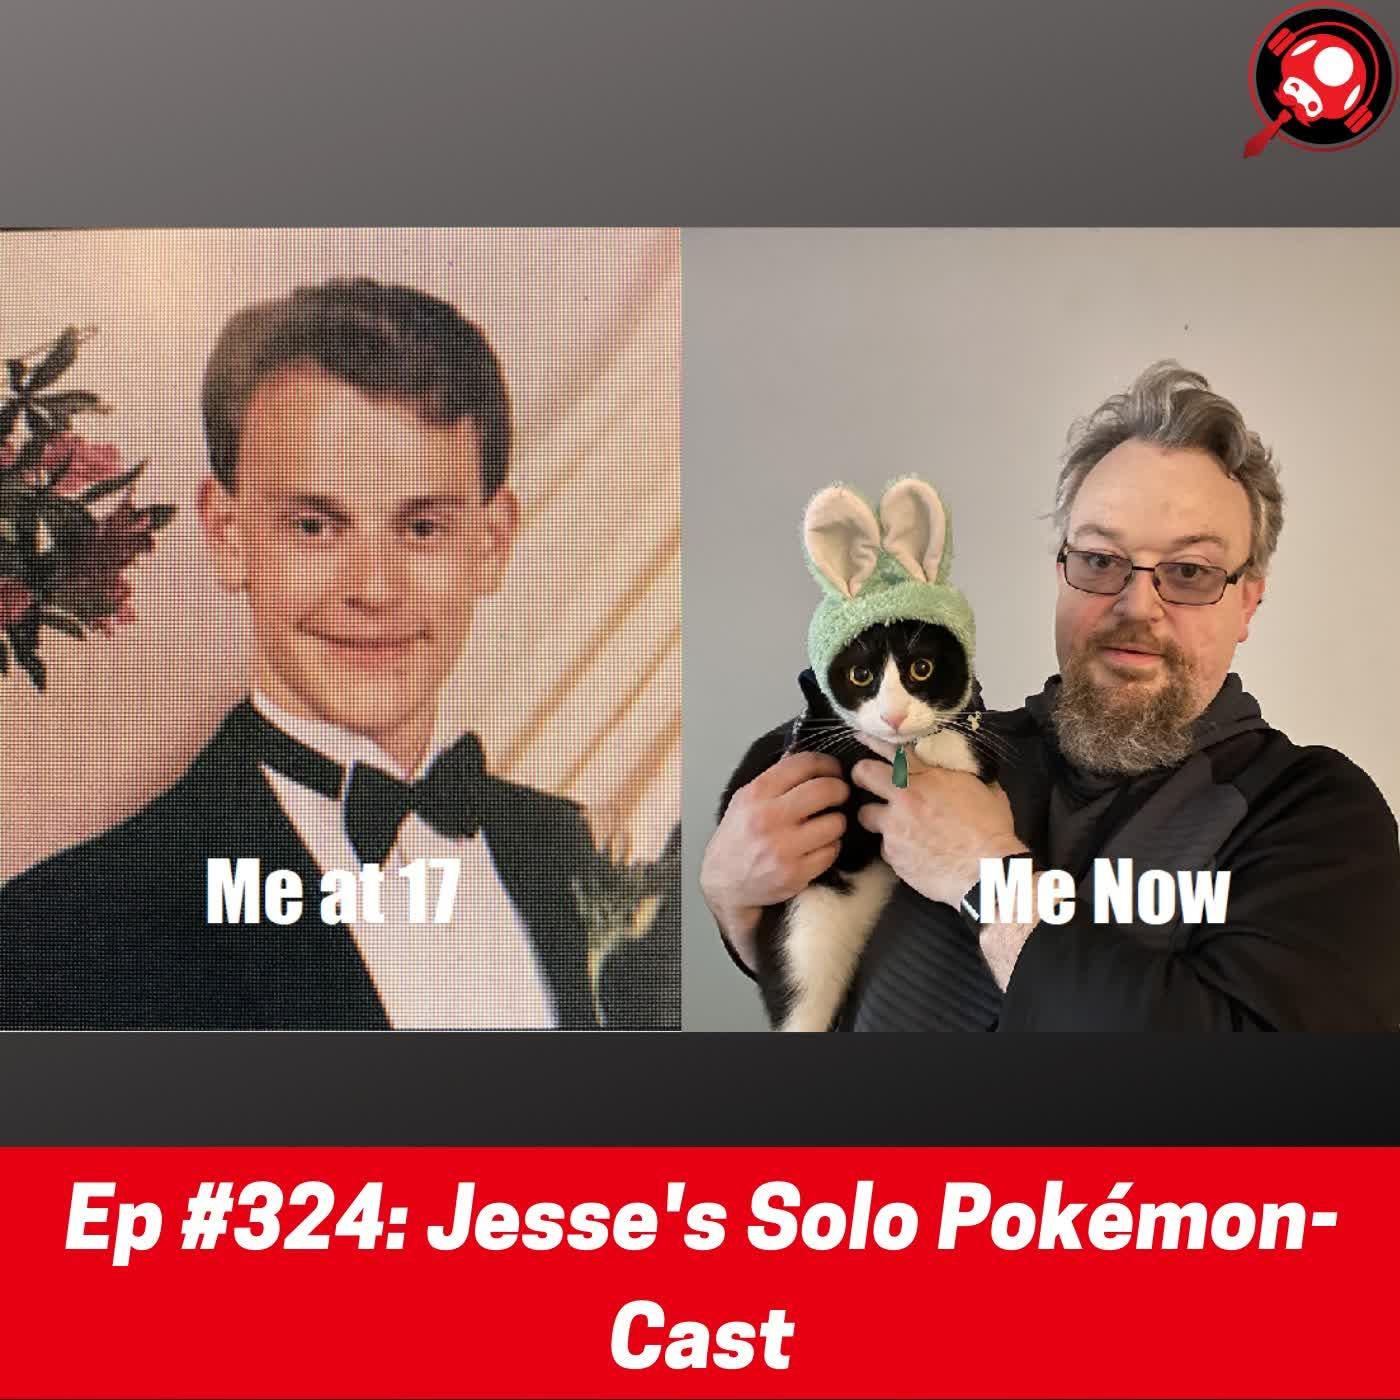 #324: Jesse's Solo Pokémon-Cast